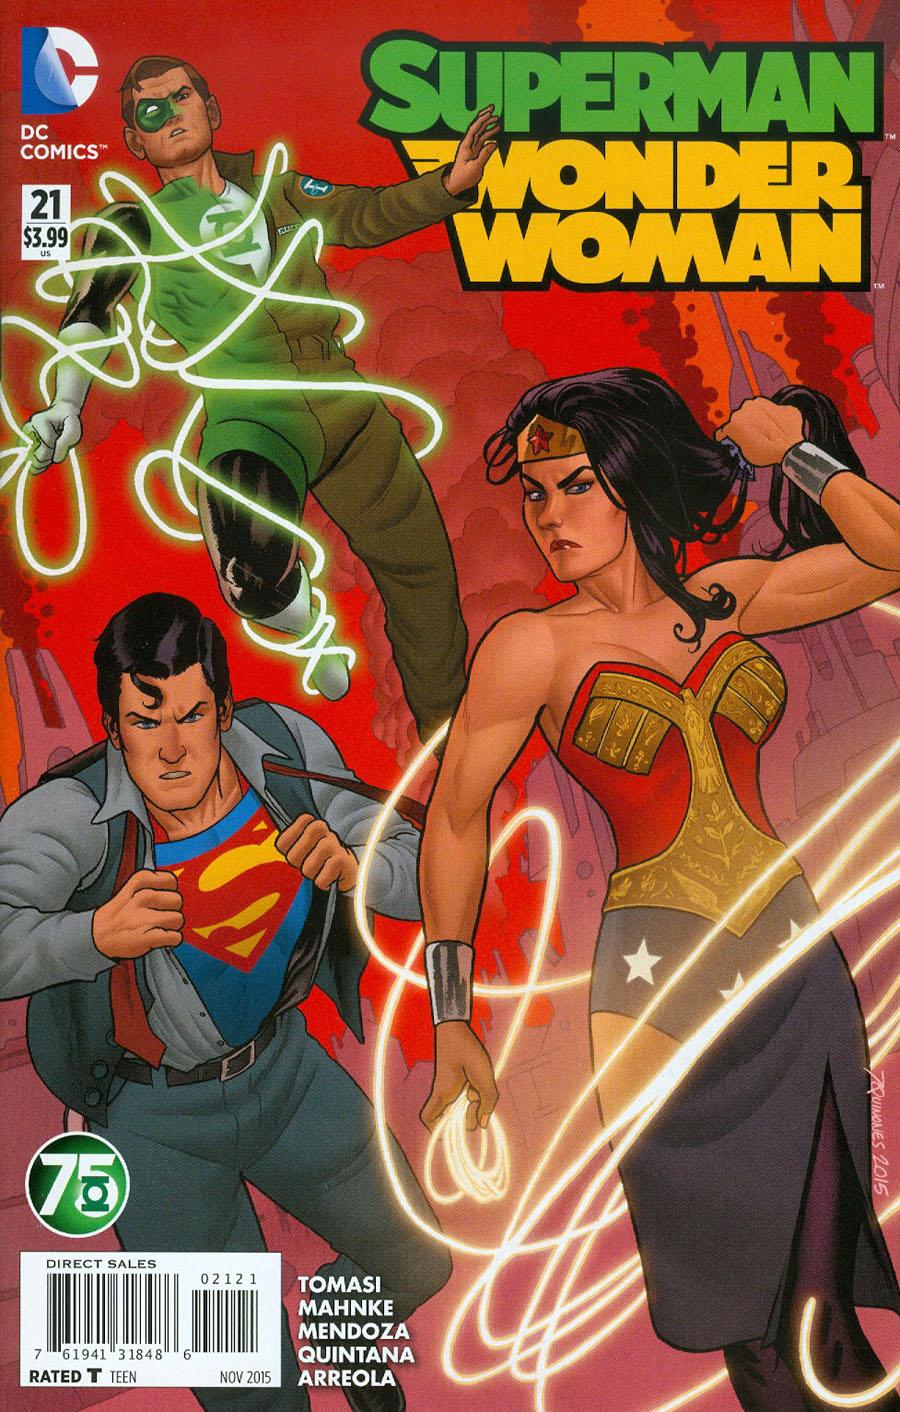 Superman Wonder Woman #21 Cover B Variant Joe Quinones Green Lantern 75th Anniversary Cover (Truth Tie-In)